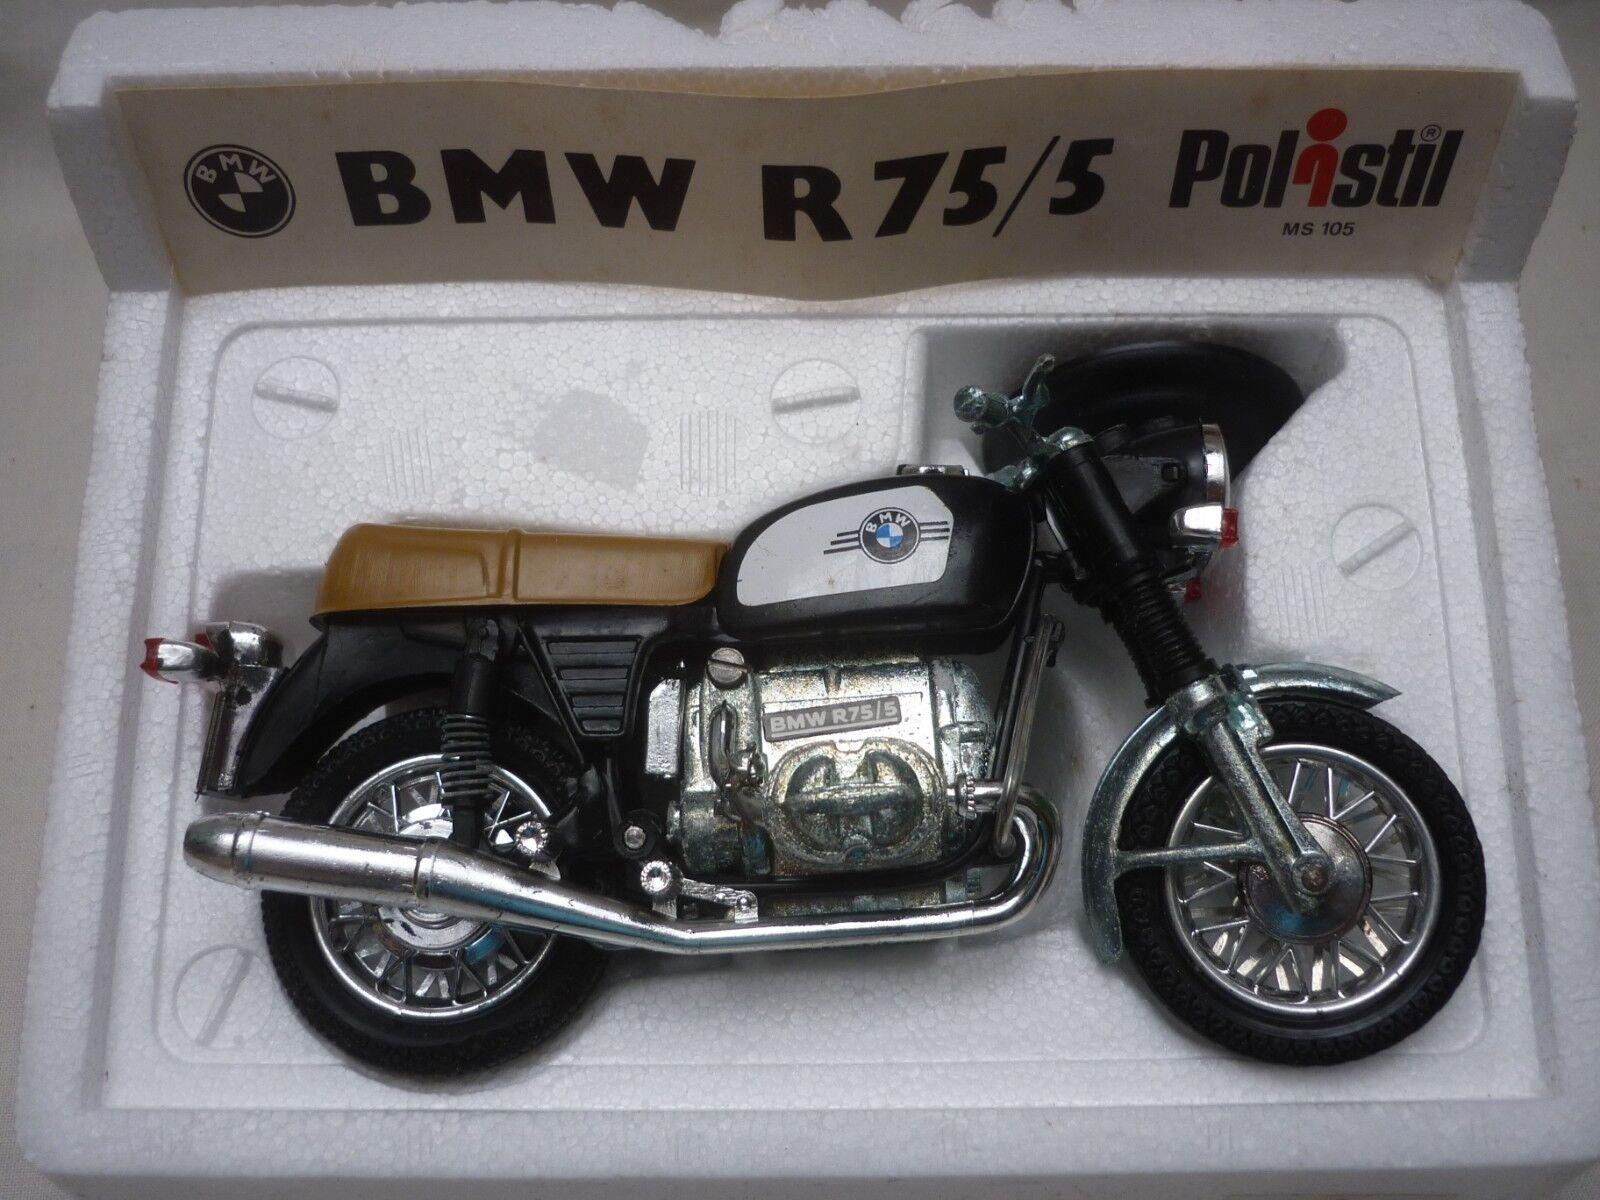 Un coffret coffret coffret POLISTIL Modèle De BMW R75 5 e16c2f